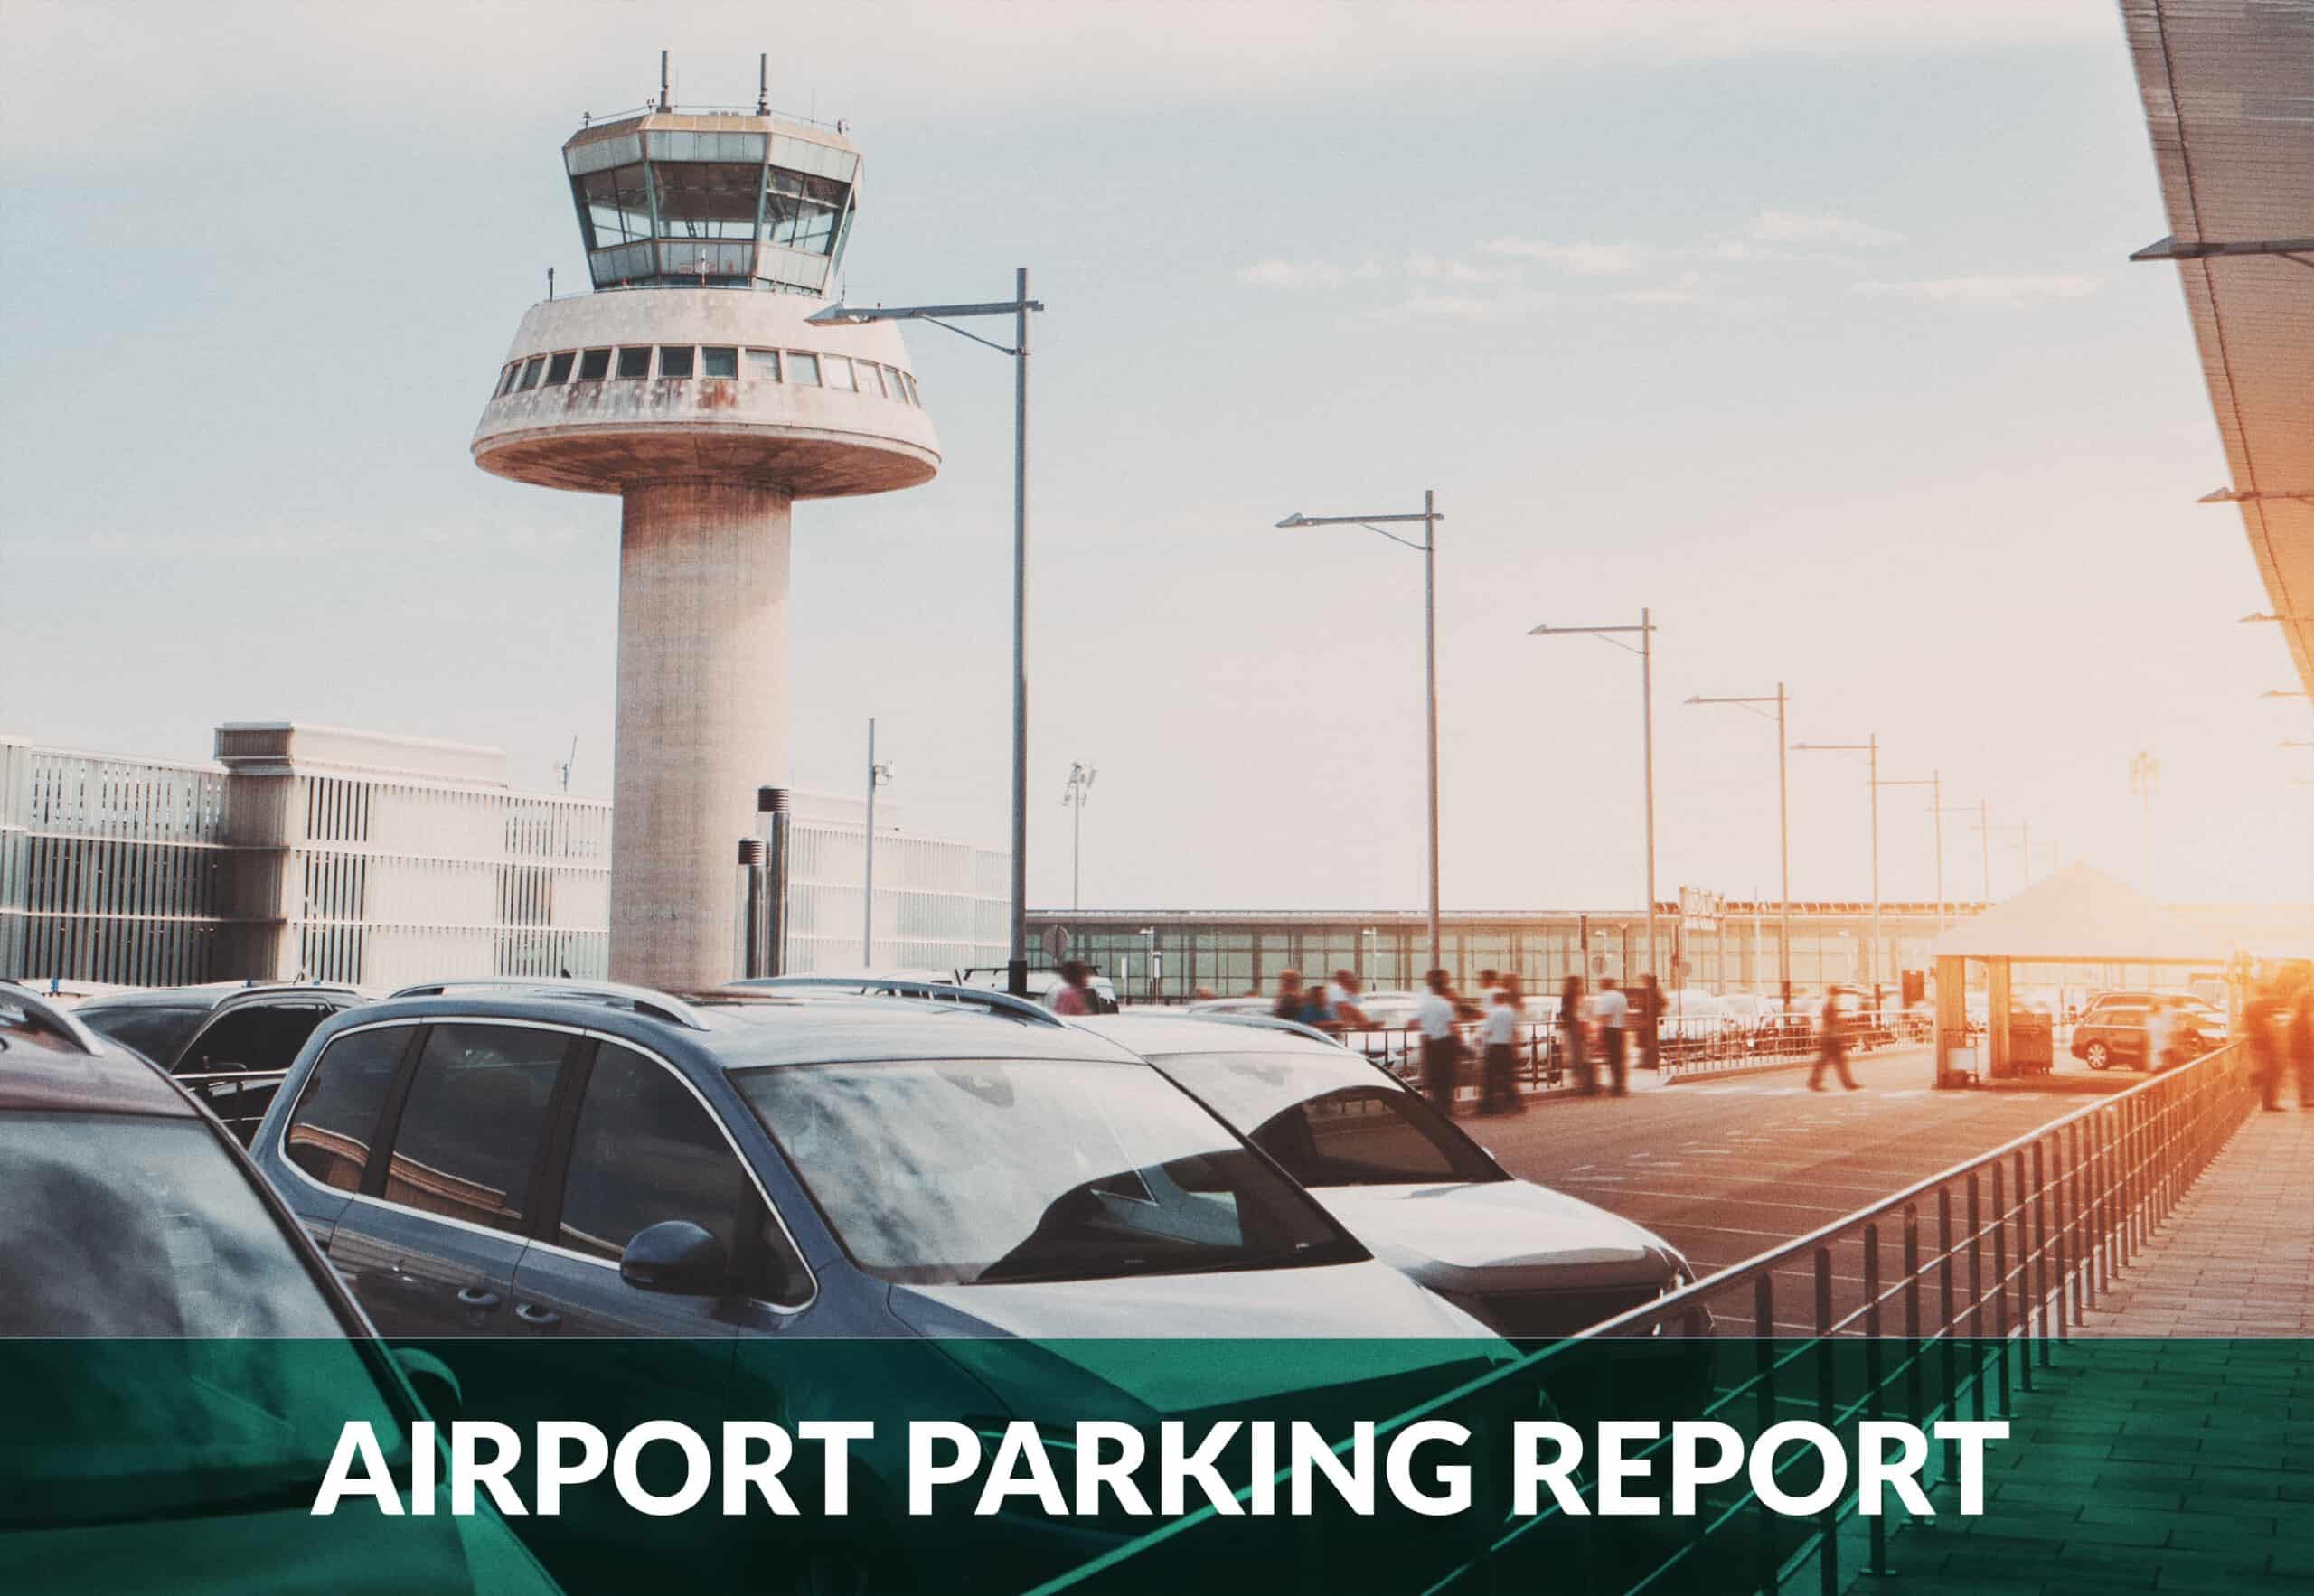 Airport parking report